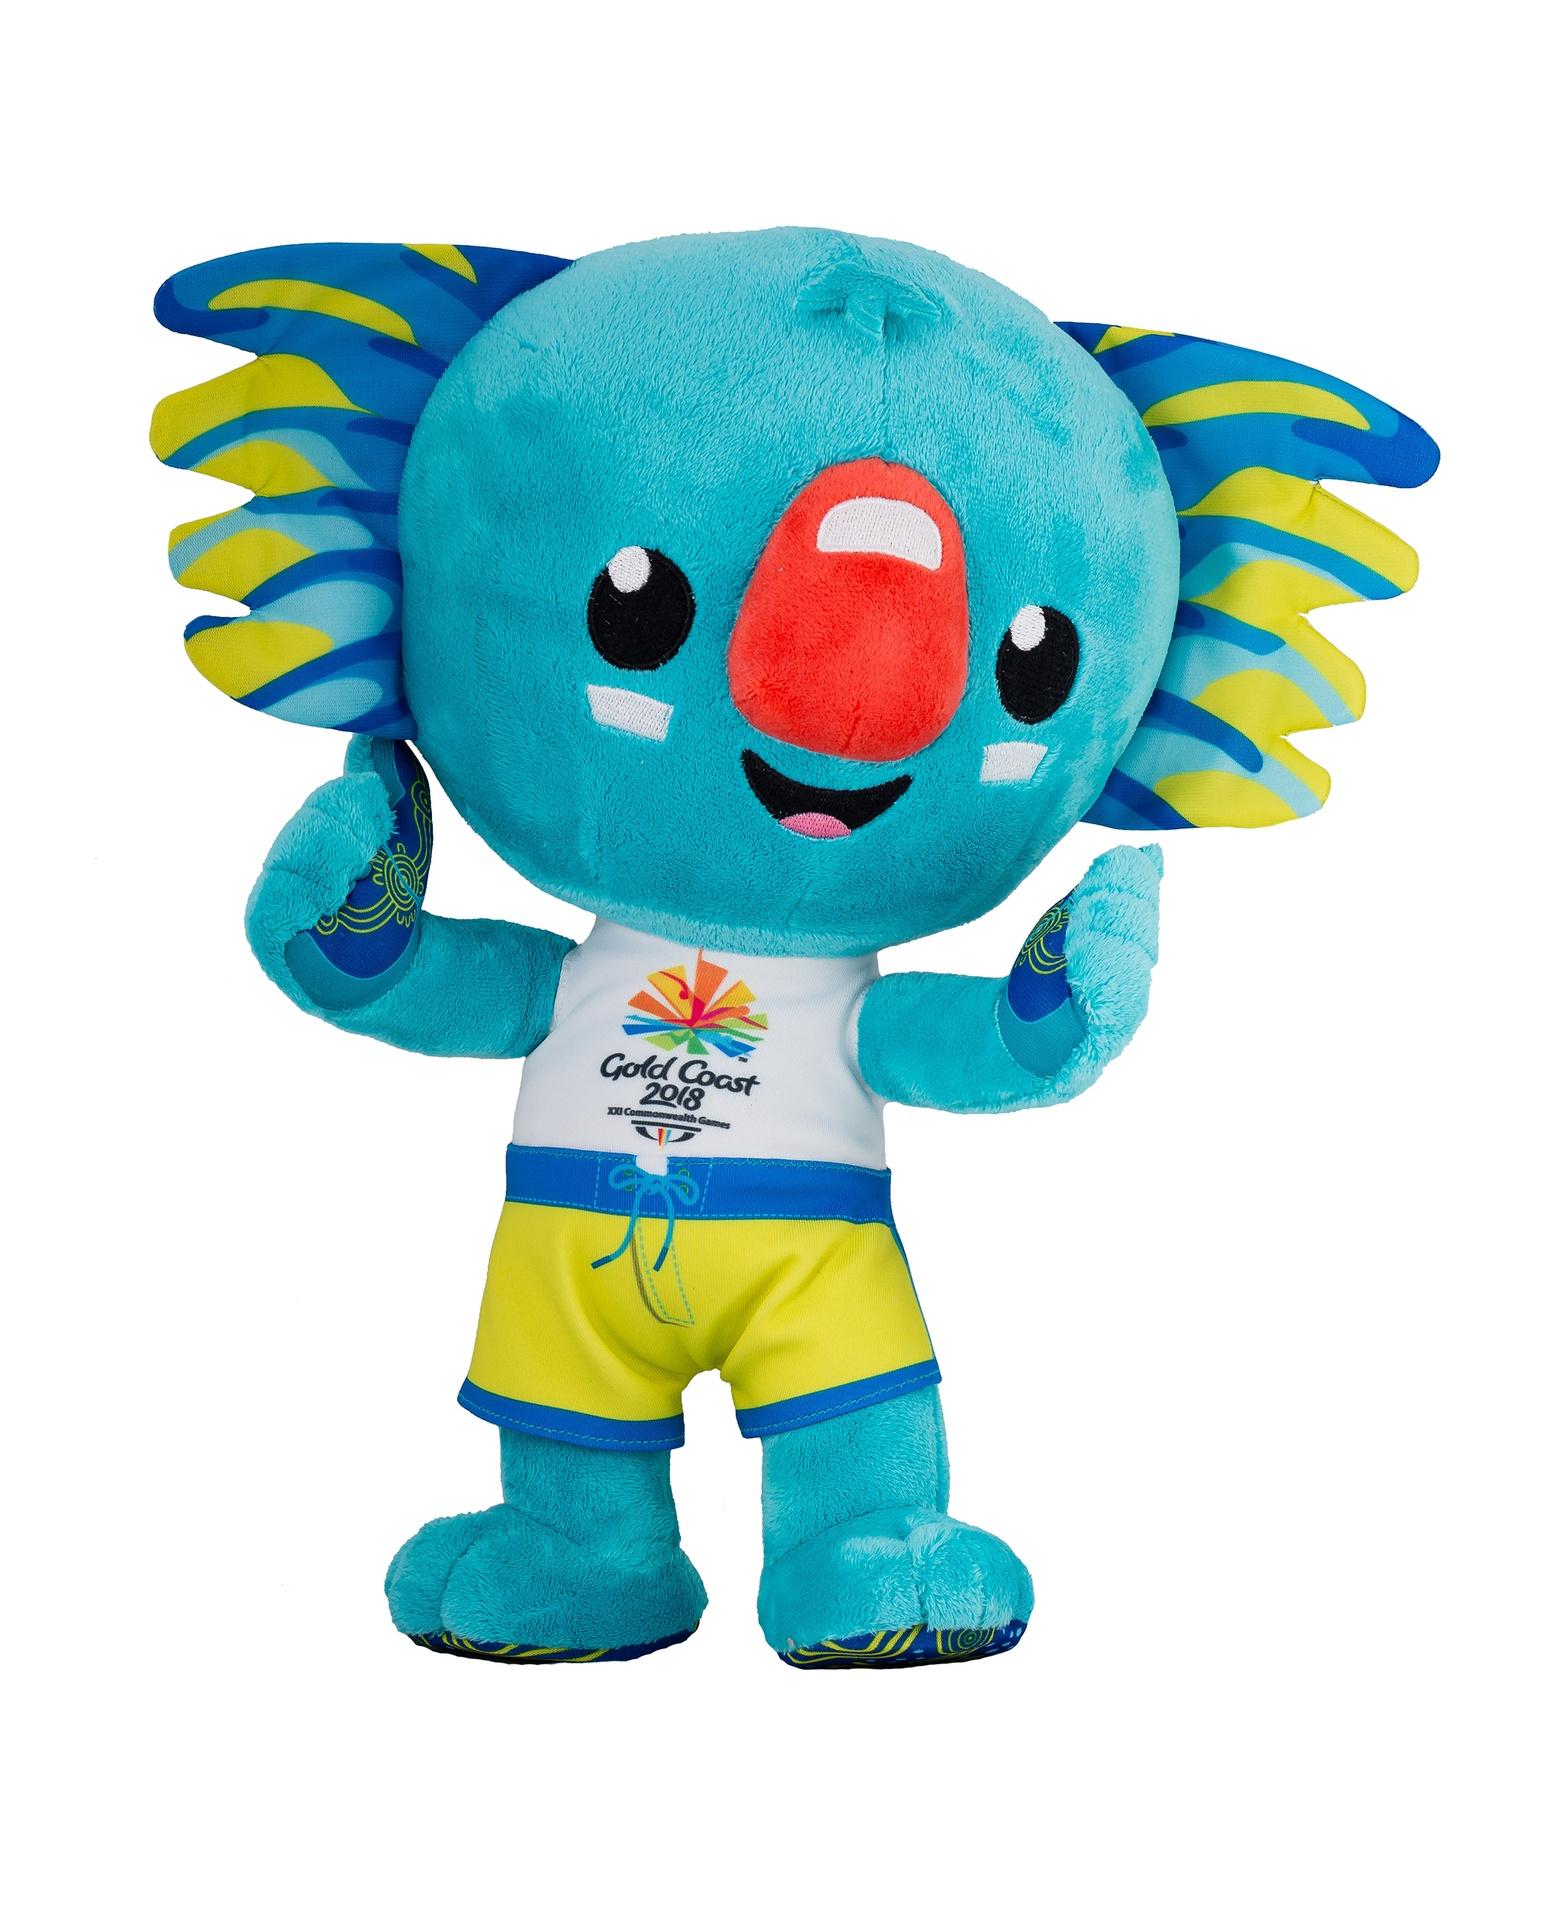 30cm Borobi Mascot Plush Toy Image